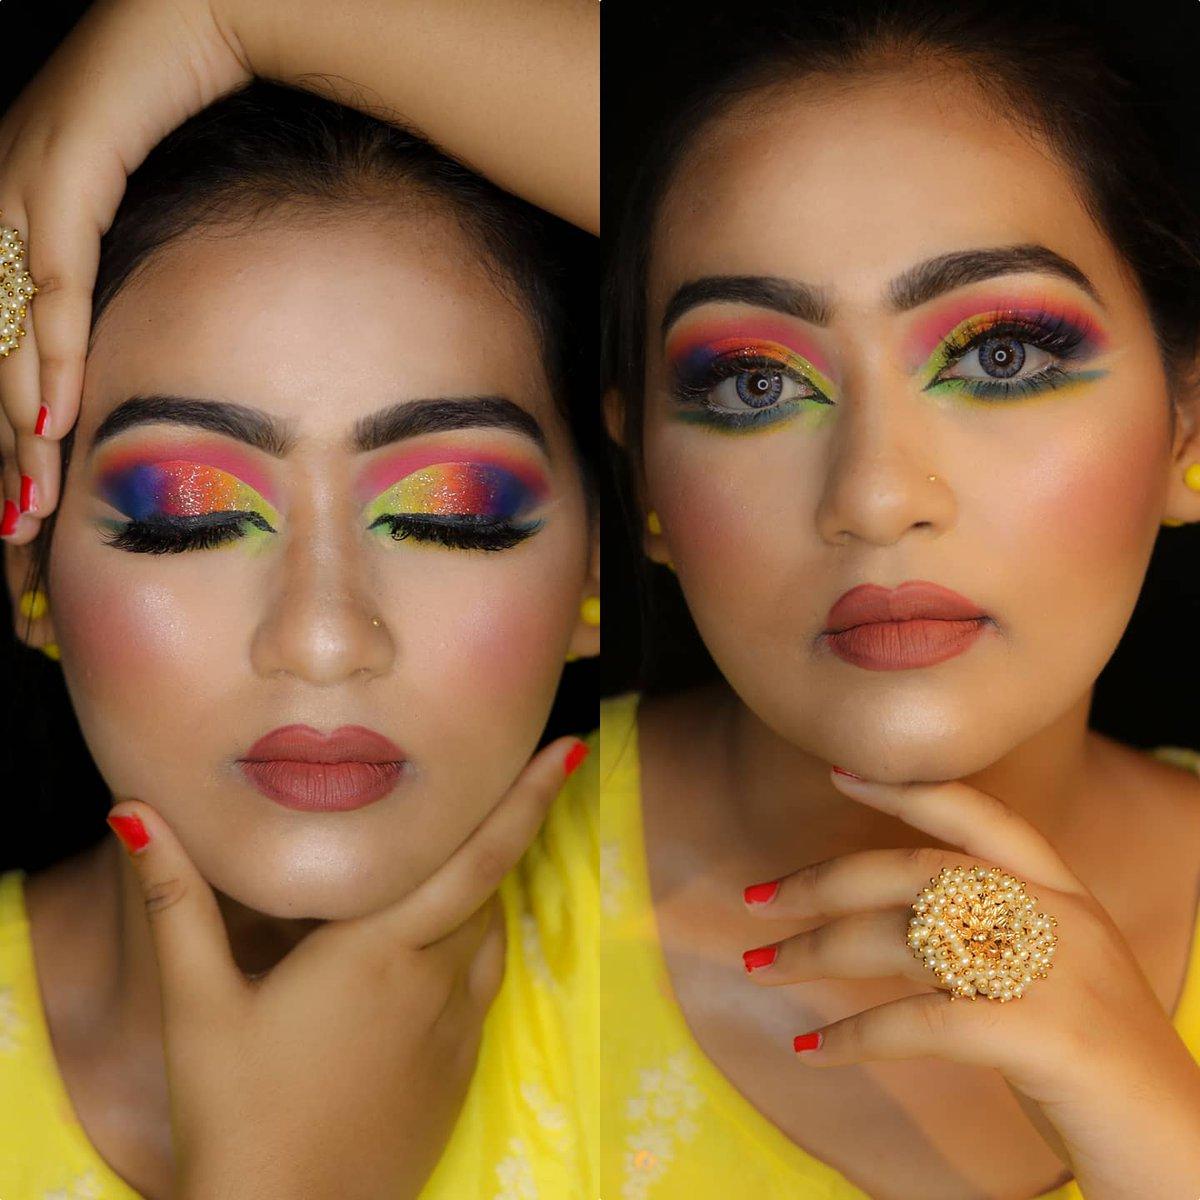 Portrait !!! @Canon_India Captured on 750D using 50mm 1.8 lens  #portrait #model #modeling #Padmanabhaswamytemple #capturedoncanon #modellife #makeup #makeupartist #makeupoftheday #portraits #photography #Photos #photographers #Stylish #makeuplover #makeuplookspic.twitter.com/AVz9tGB21X